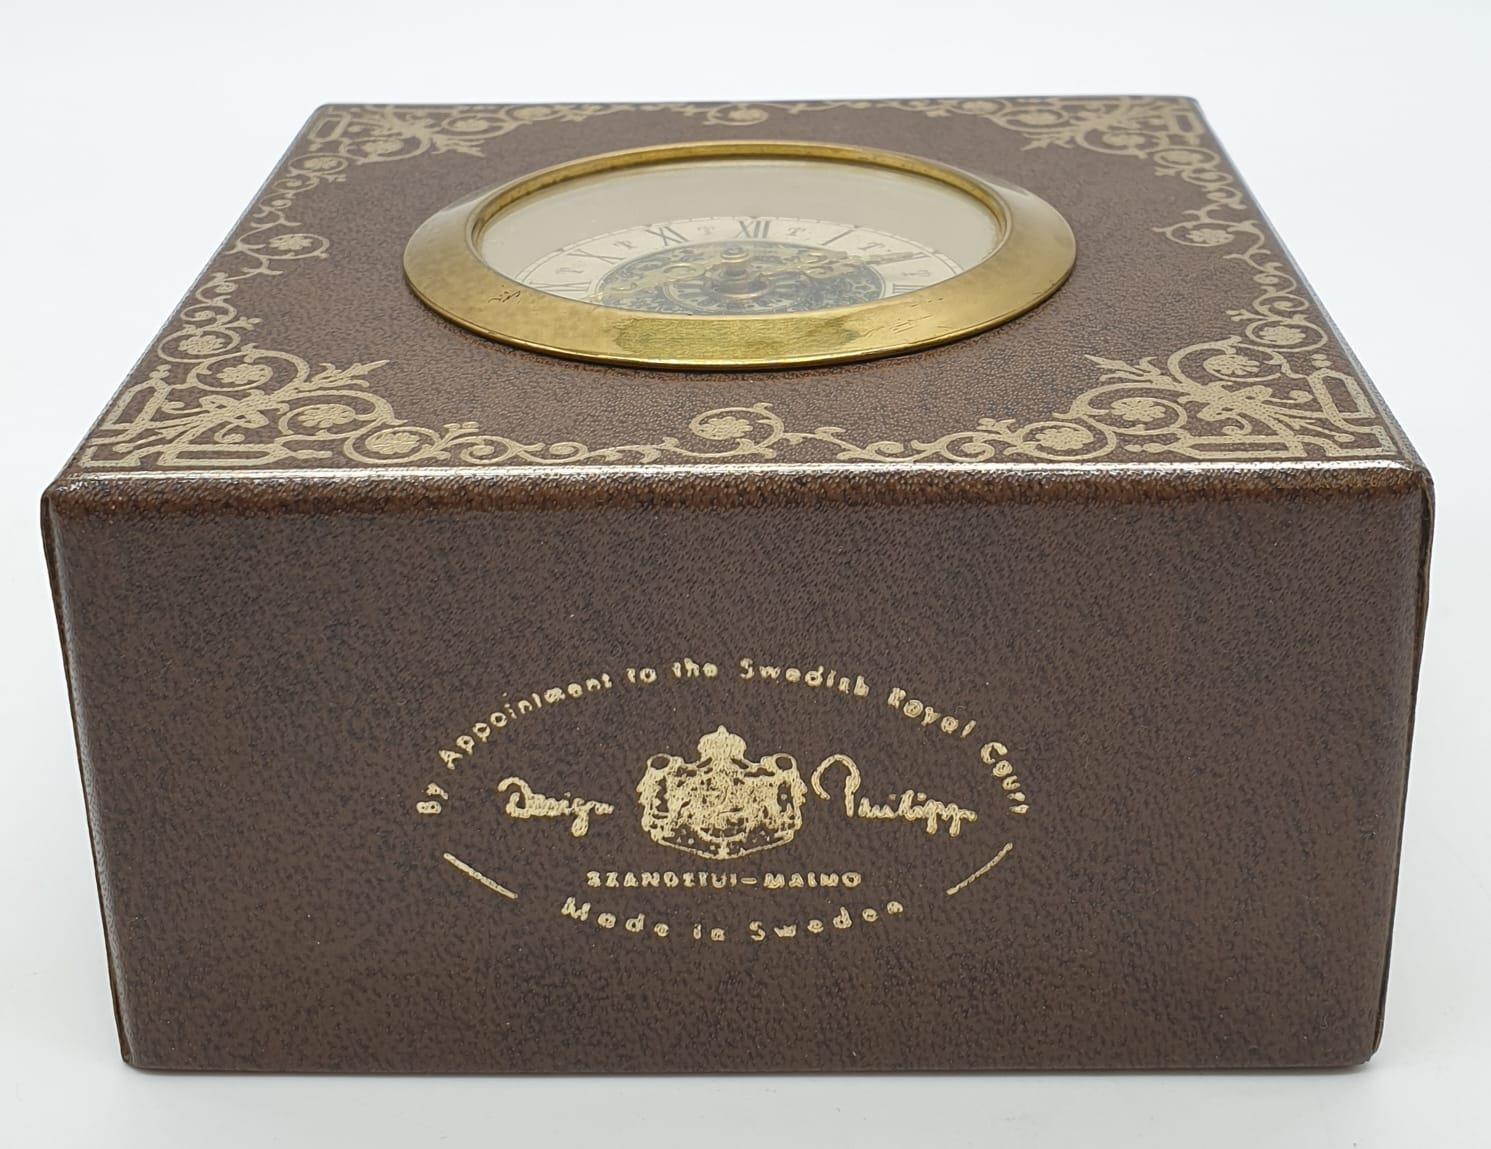 Vintage Mantle Wind-up Clock by Meccedes Phillip Skandetui Malmo, Swedish Designer. 10.5 x 10.5cm. - Image 3 of 7